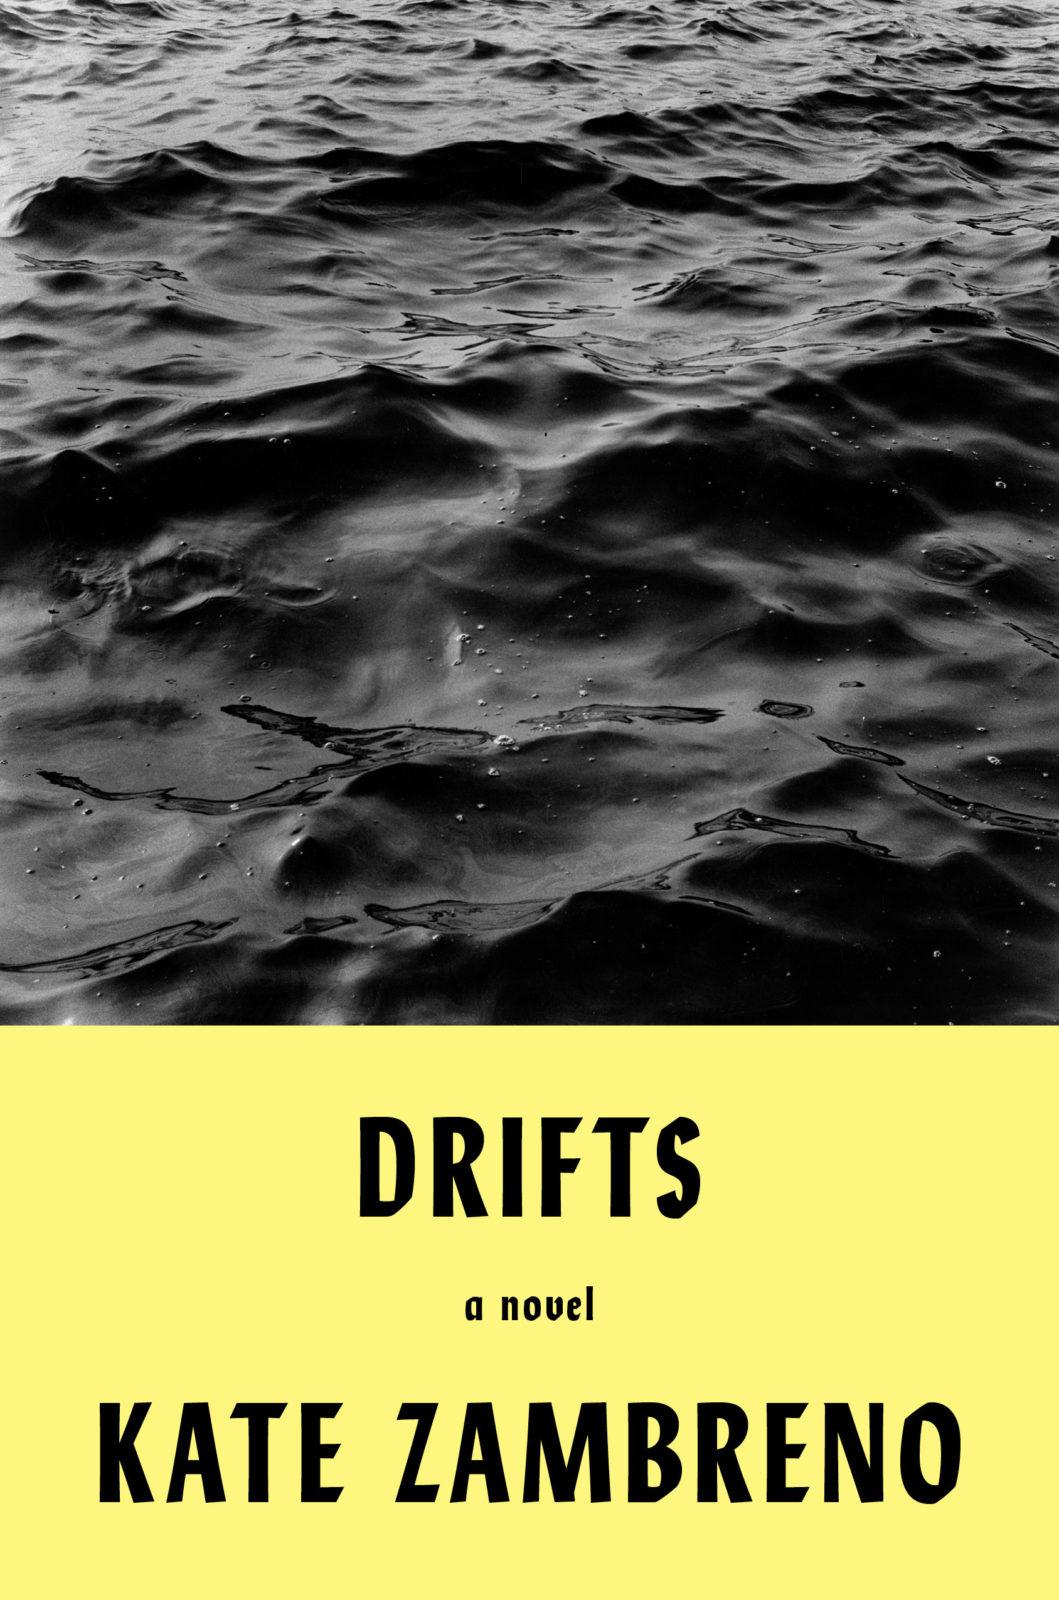 Kate Zambreno, DRIFTS Book Cover